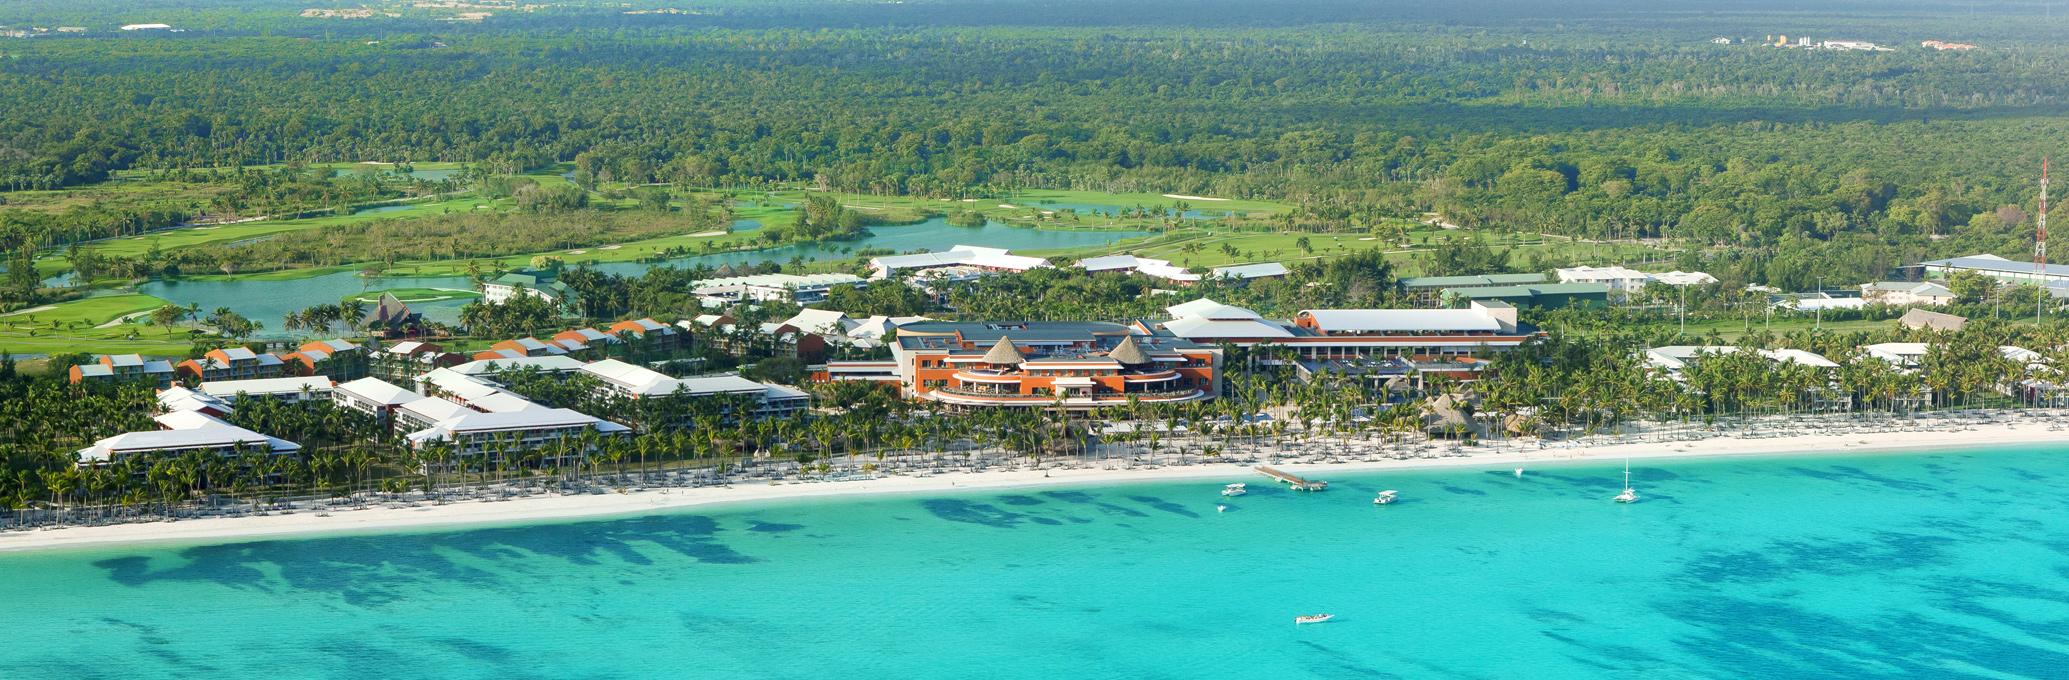 Best Dominican Republic Hotels: Barcelo Bavaro Grand Resort